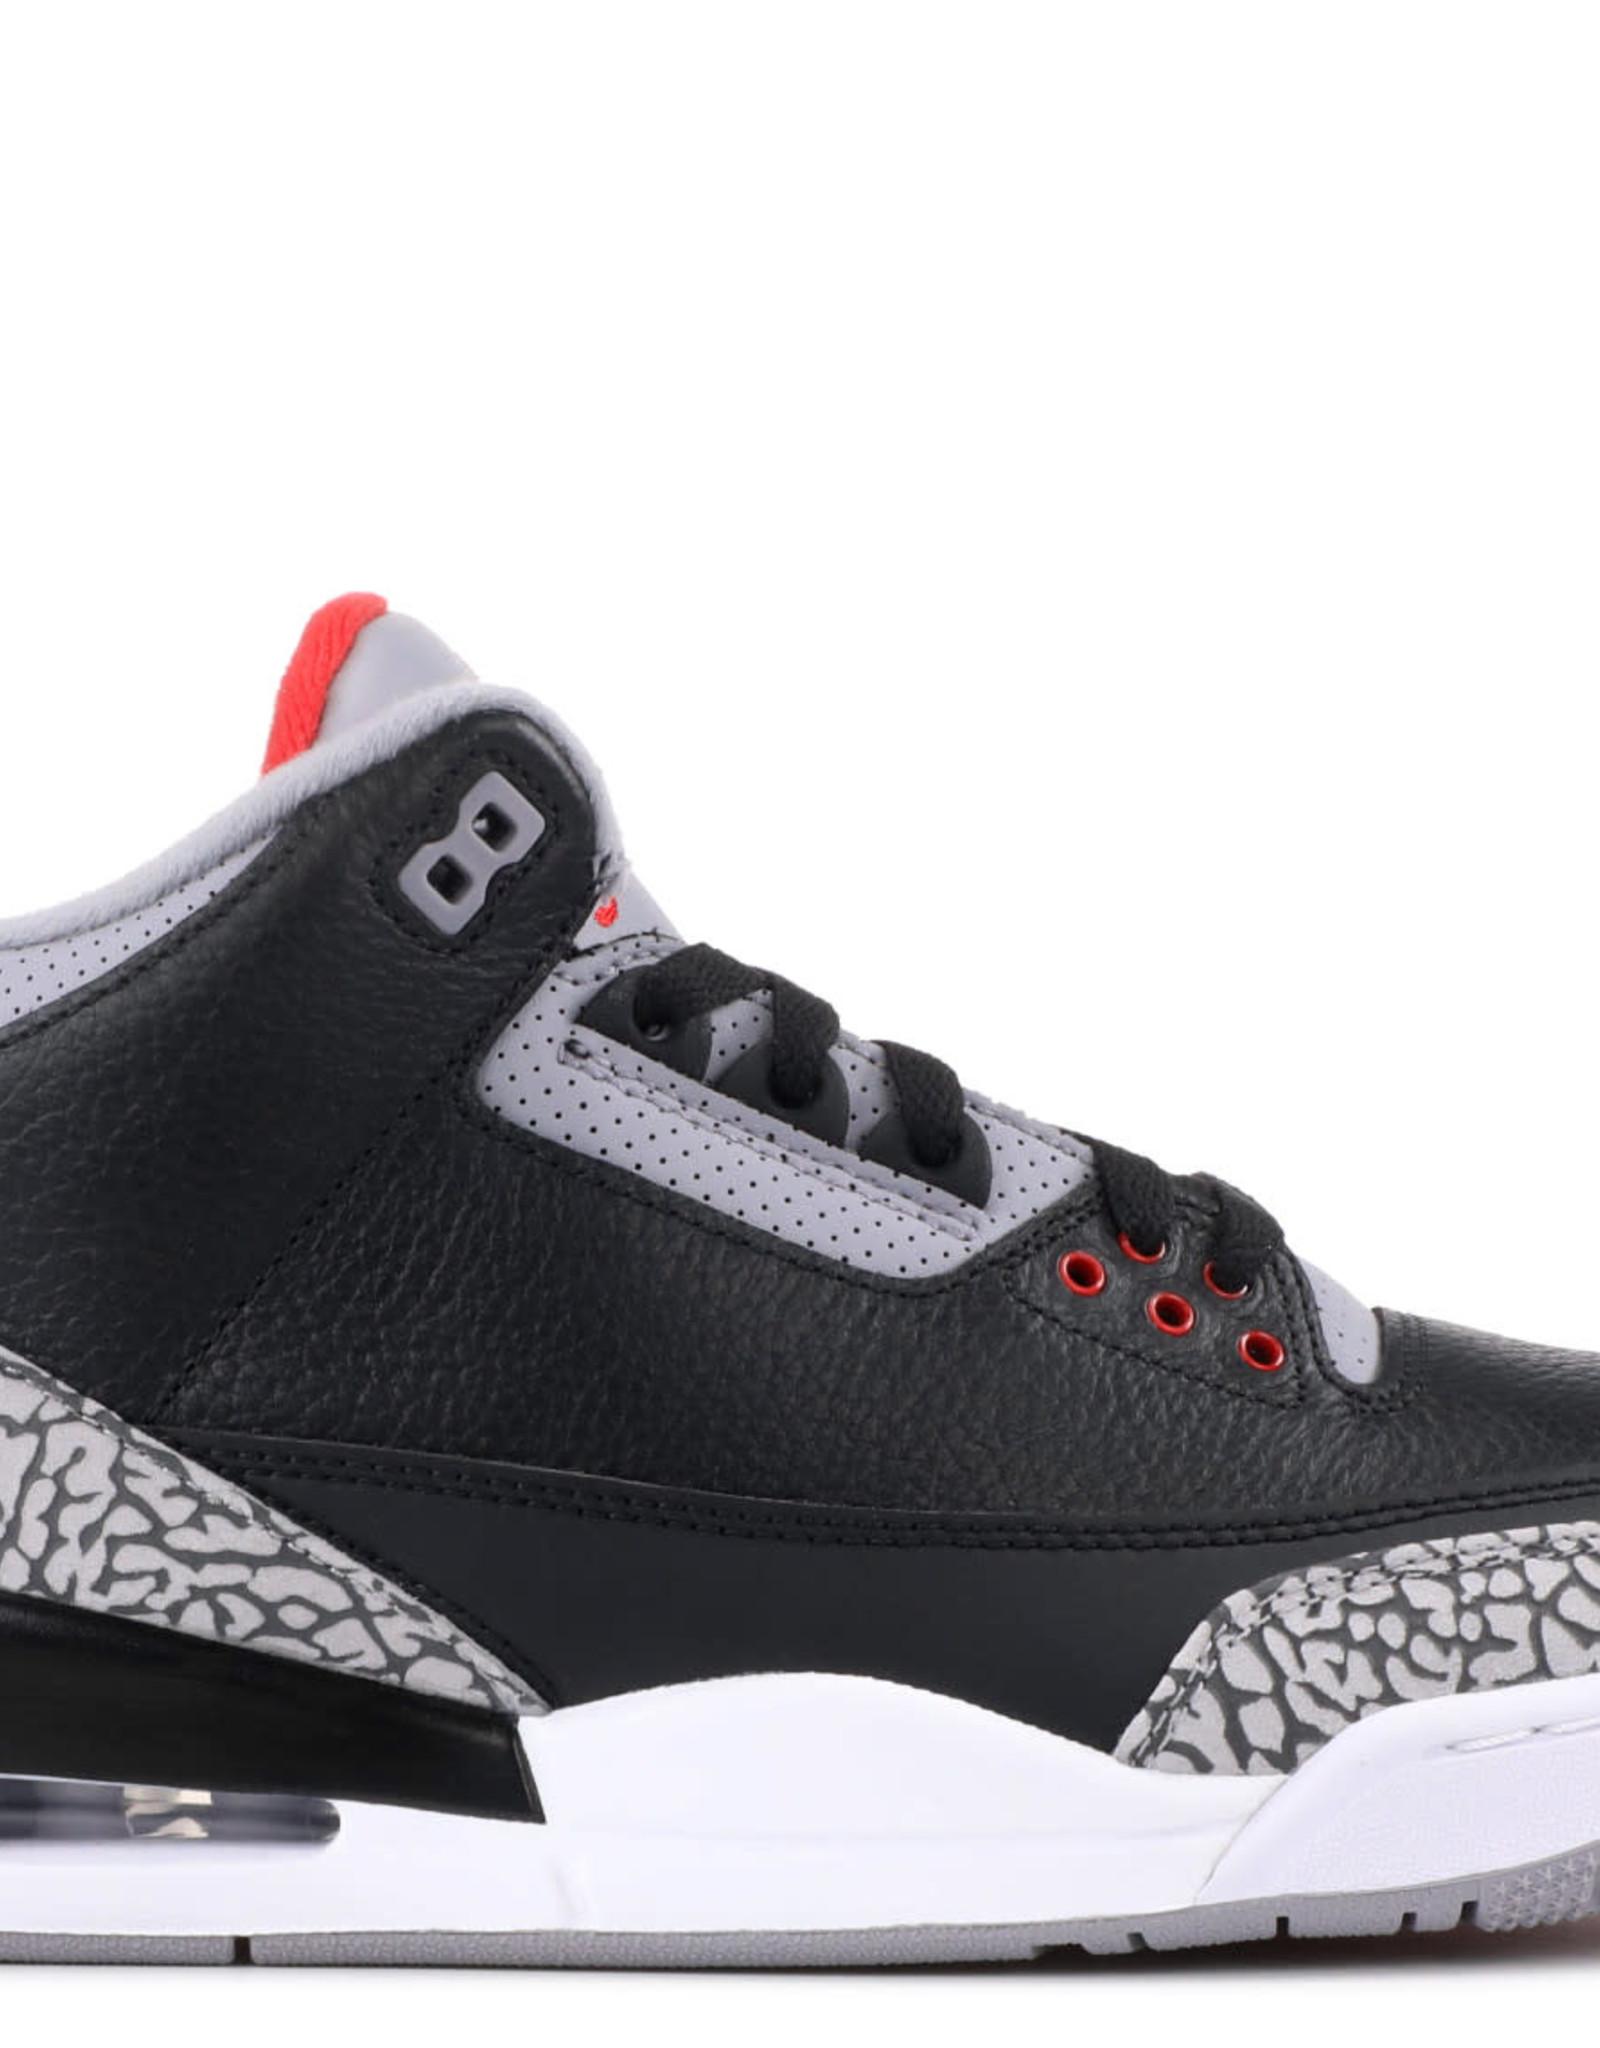 JORDAN Jordan 3 Retro Black Cement (2018)